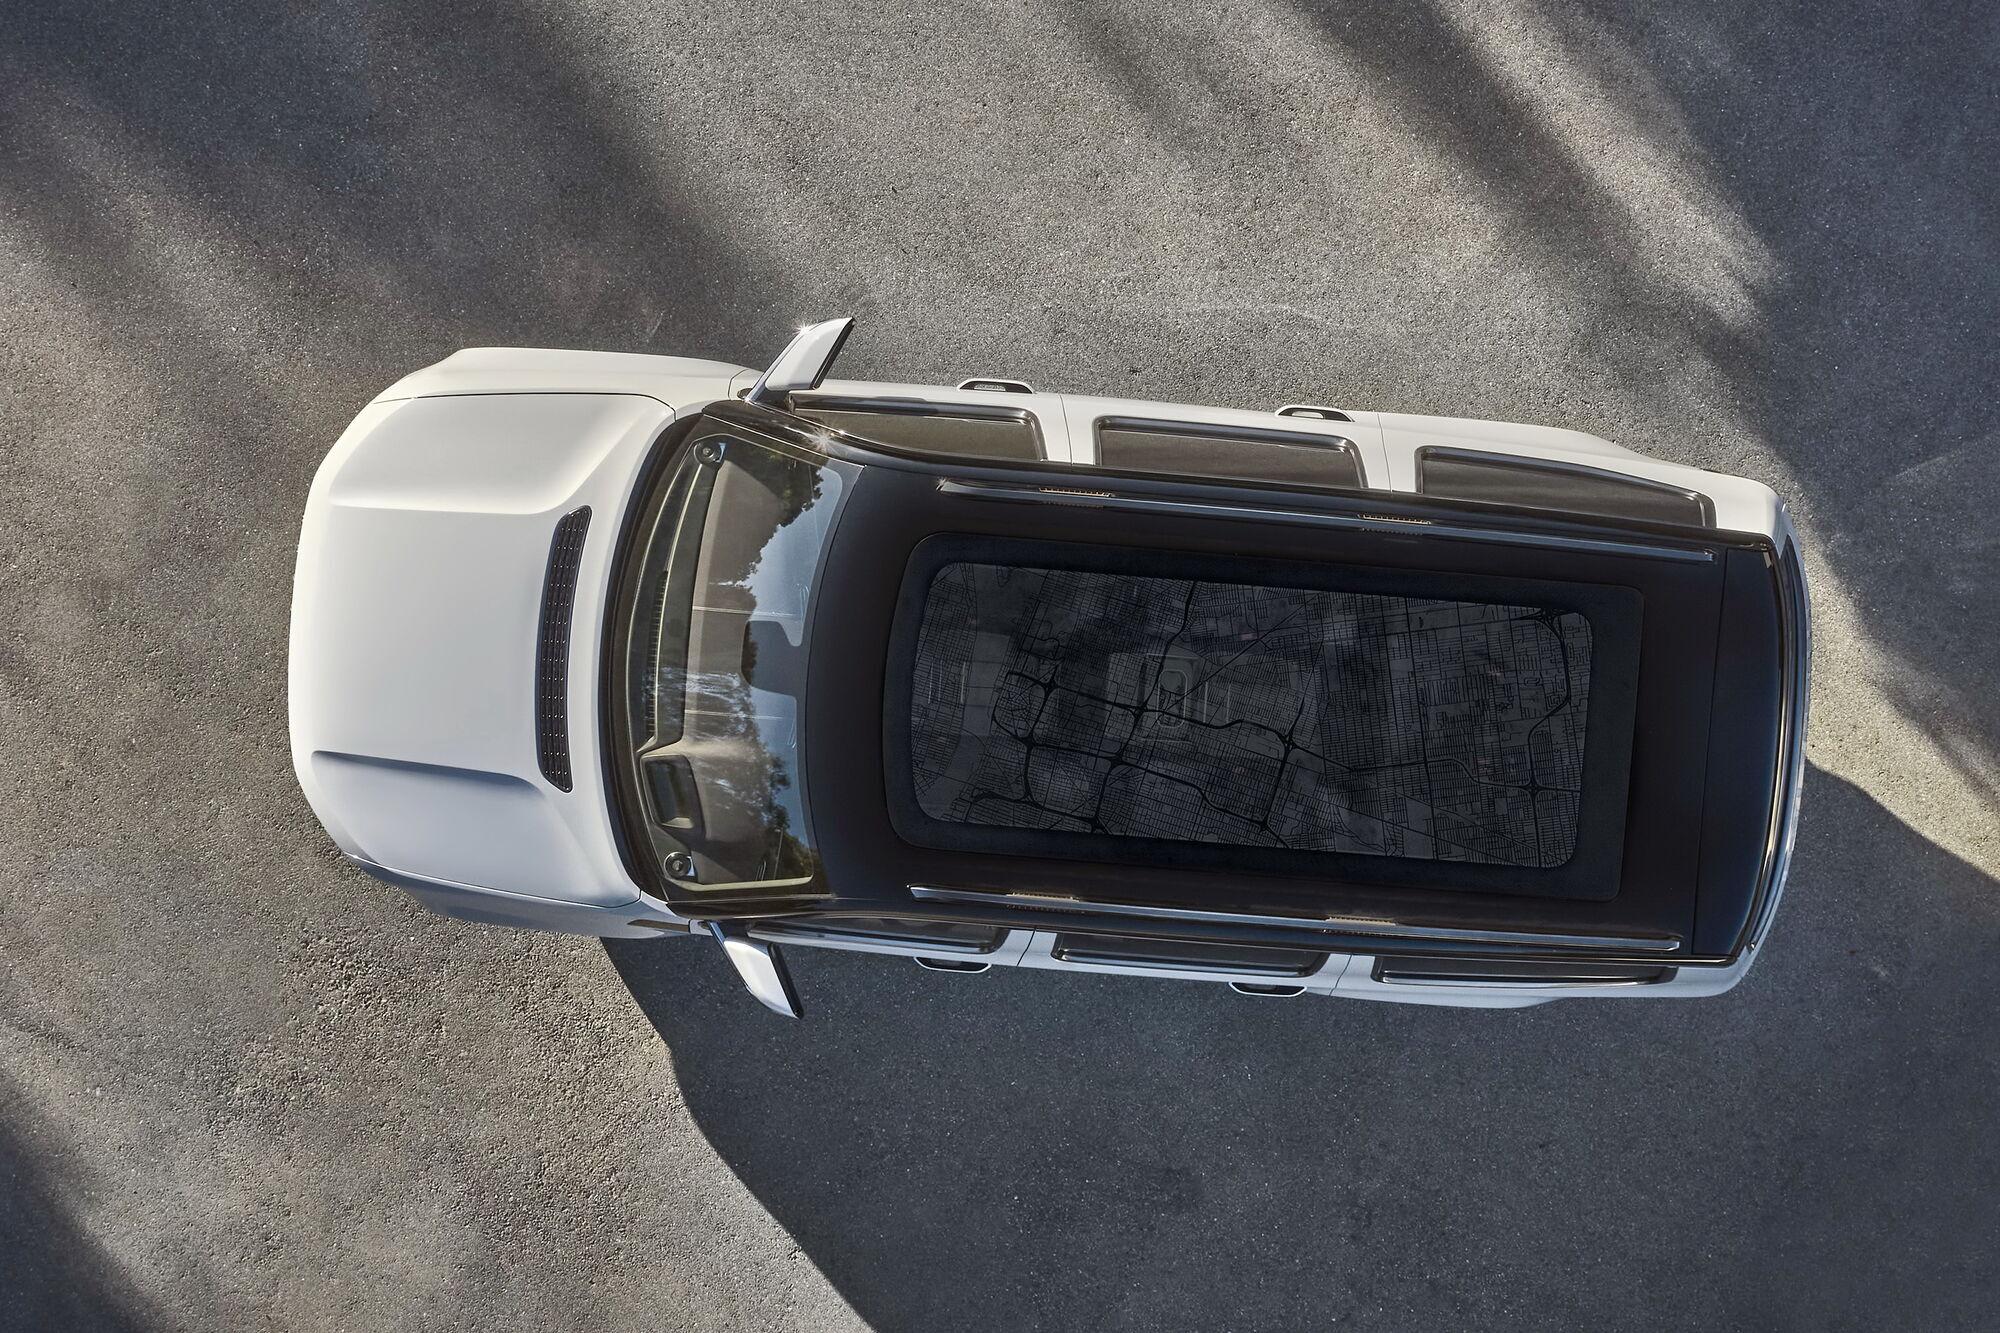 2021 Jeep Wagoneer получит большую панорамную крышу. Фото: